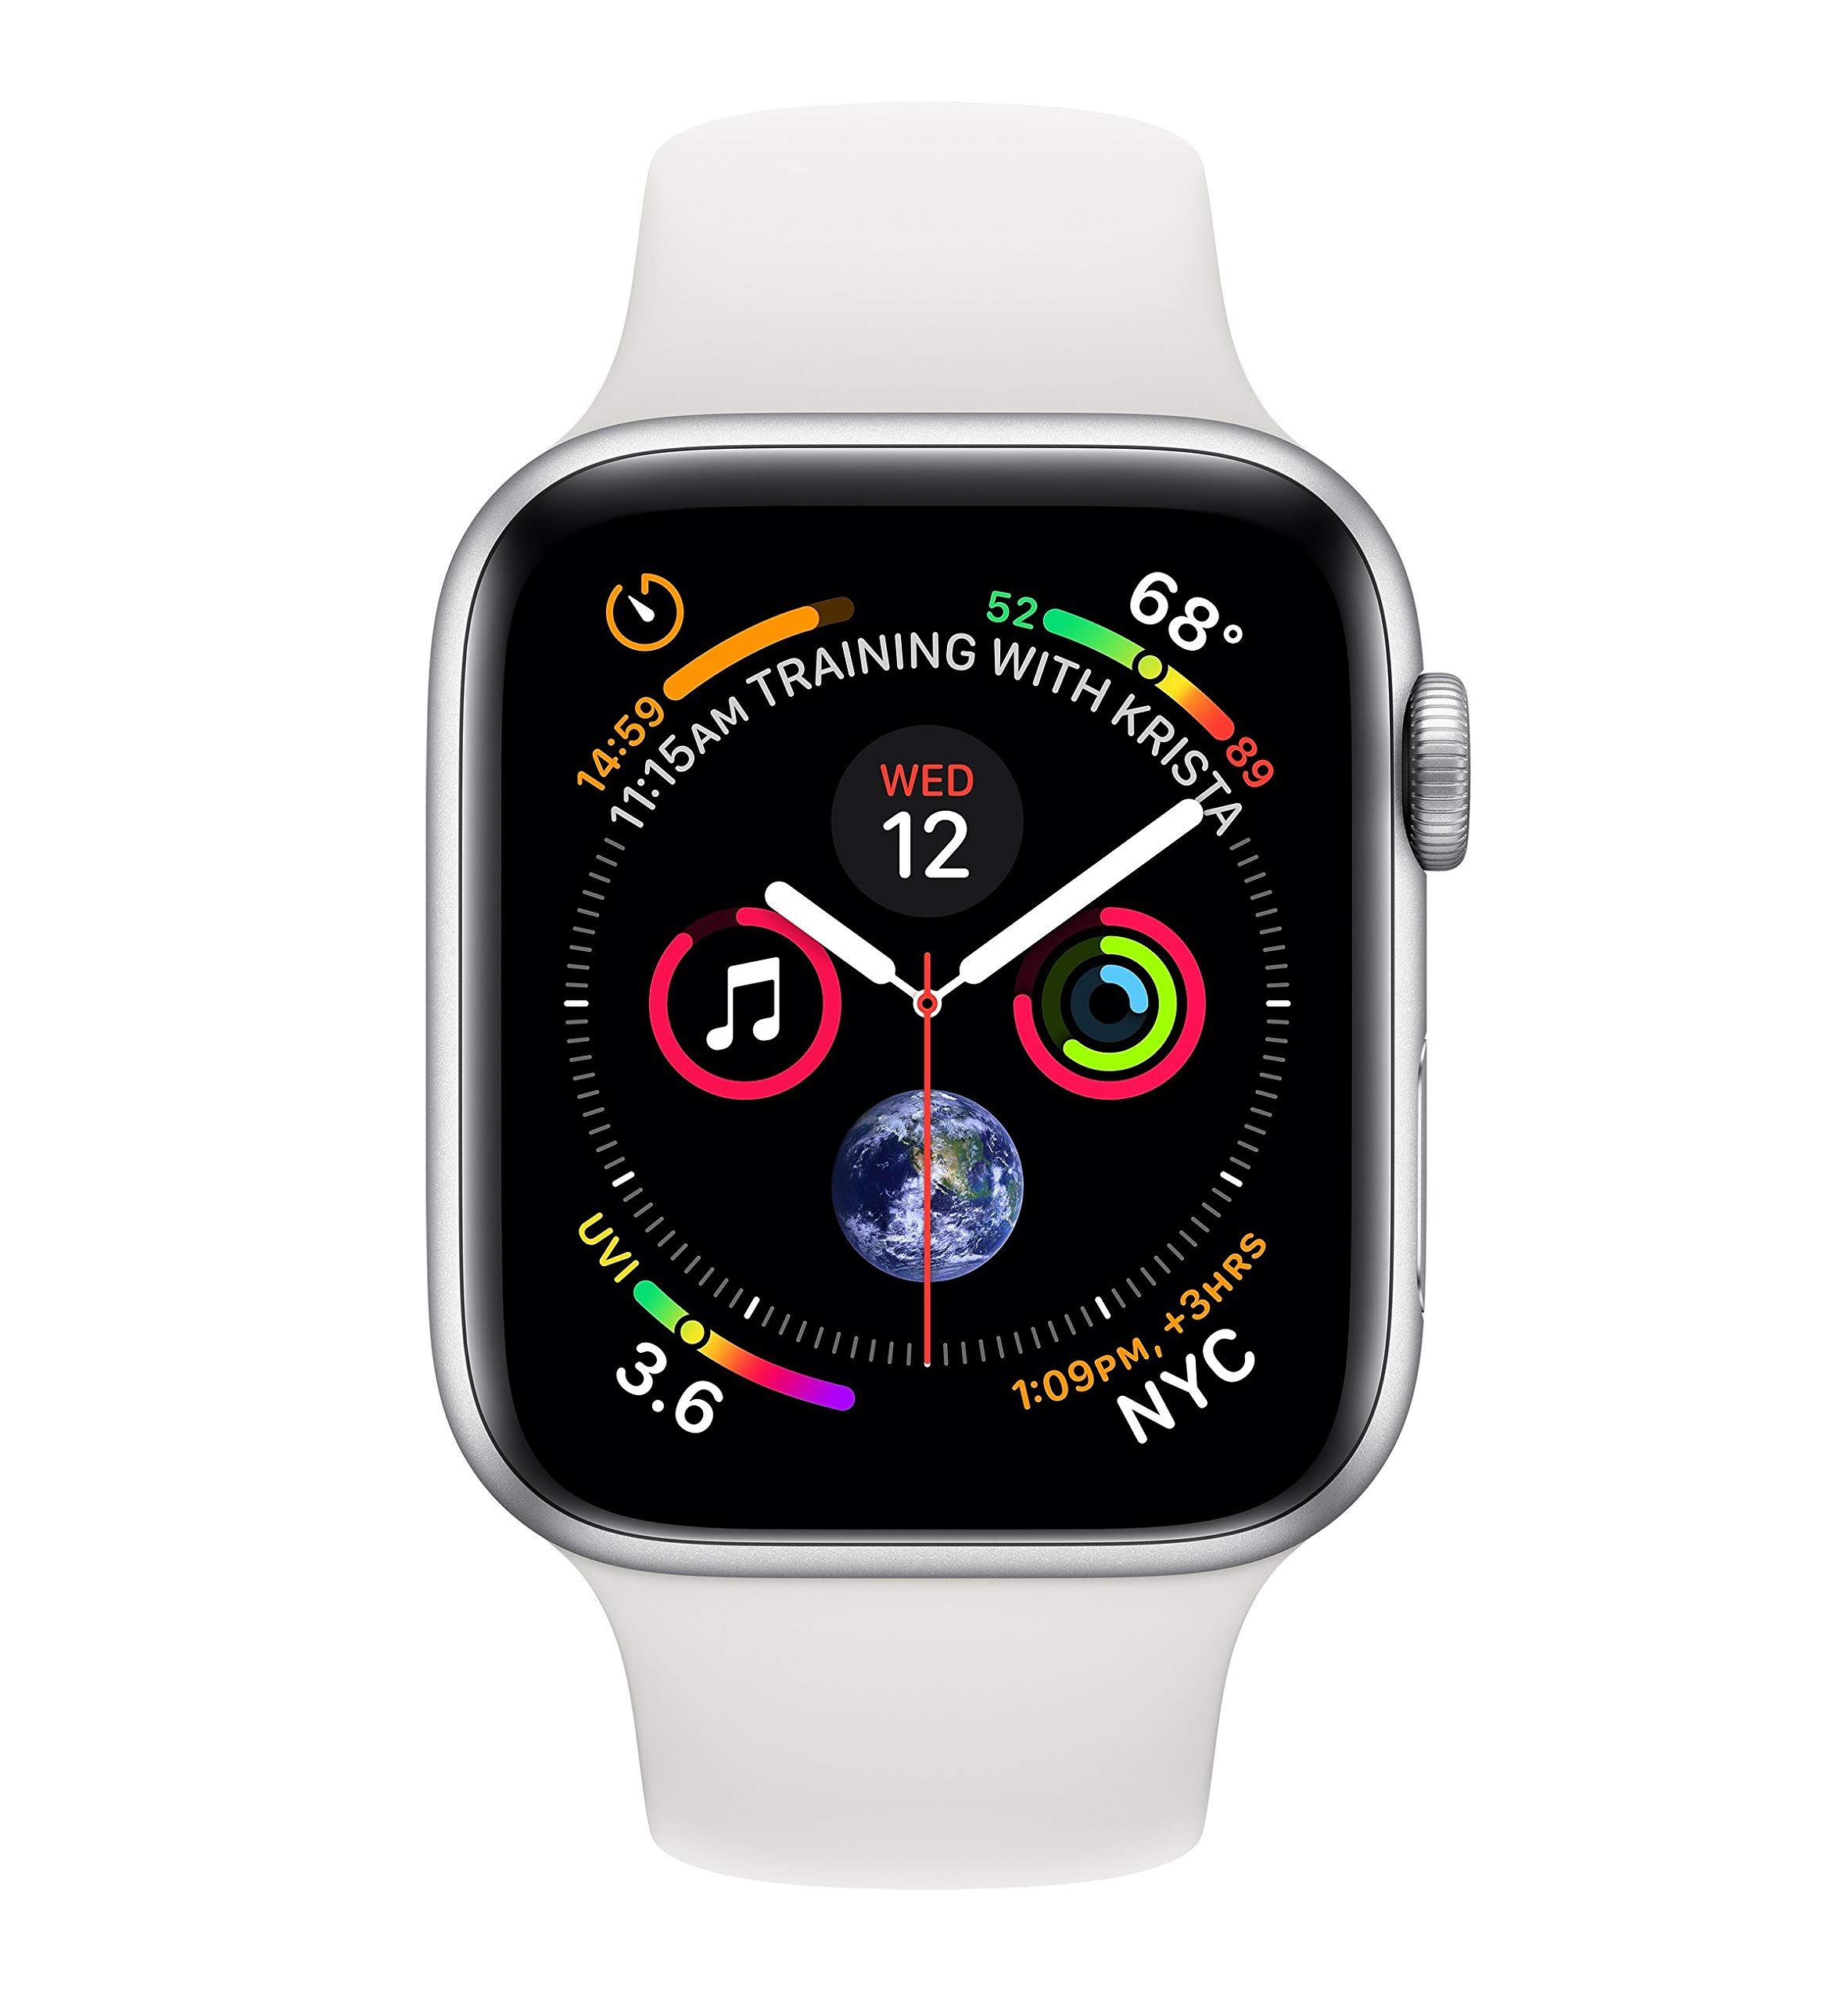 Apple Watch Series 4 Gps Cellular 40 Mm Aluminiumgehause Silber Mit Sportarmband Weiss Smartwatch Apfeluhr Apple Watch Kaufen